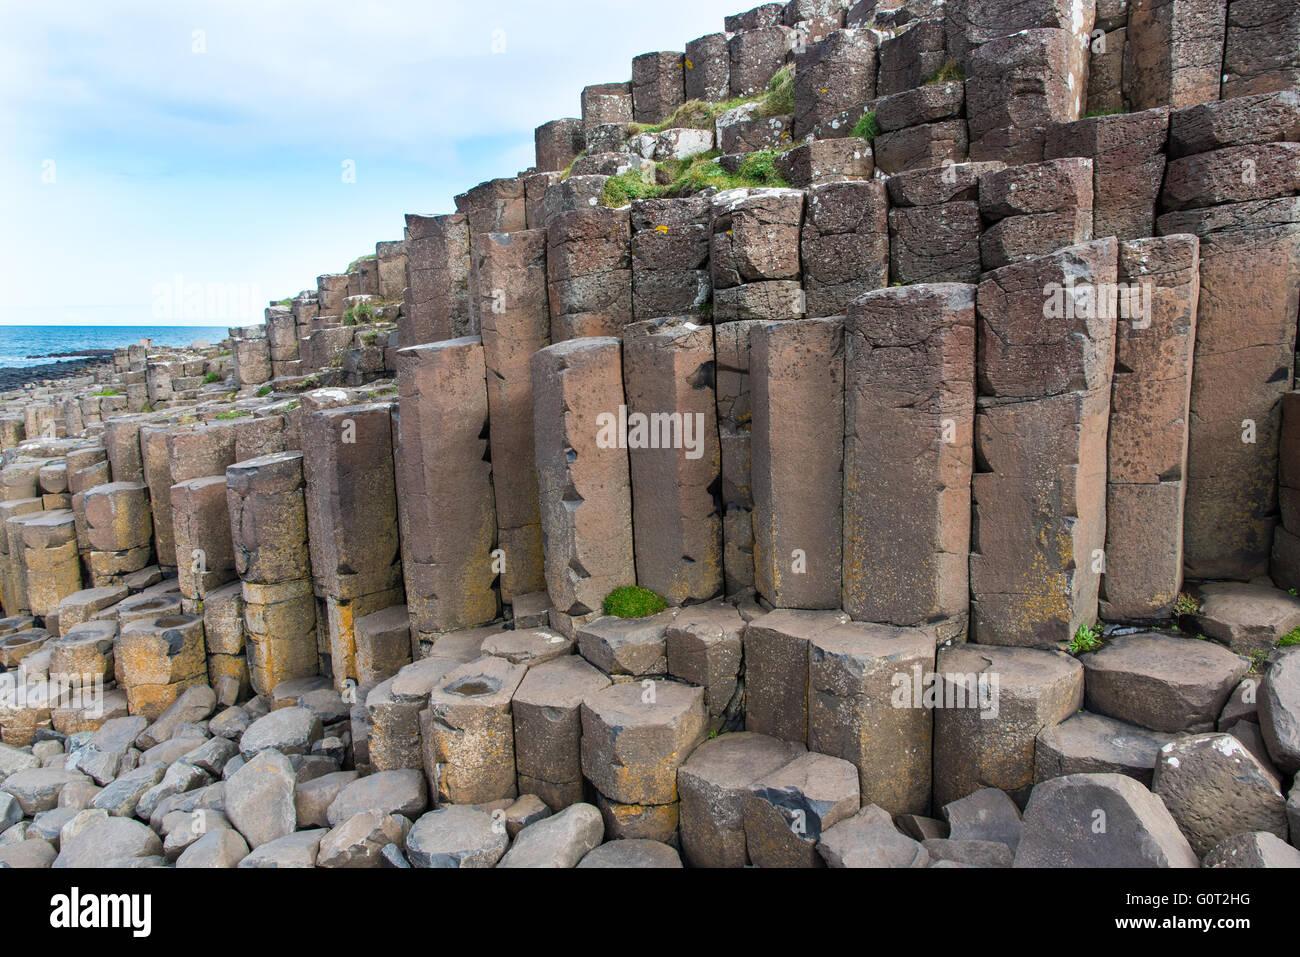 Basalt columns at the Giant's Causeway, Northern Ireland. Stock Photo